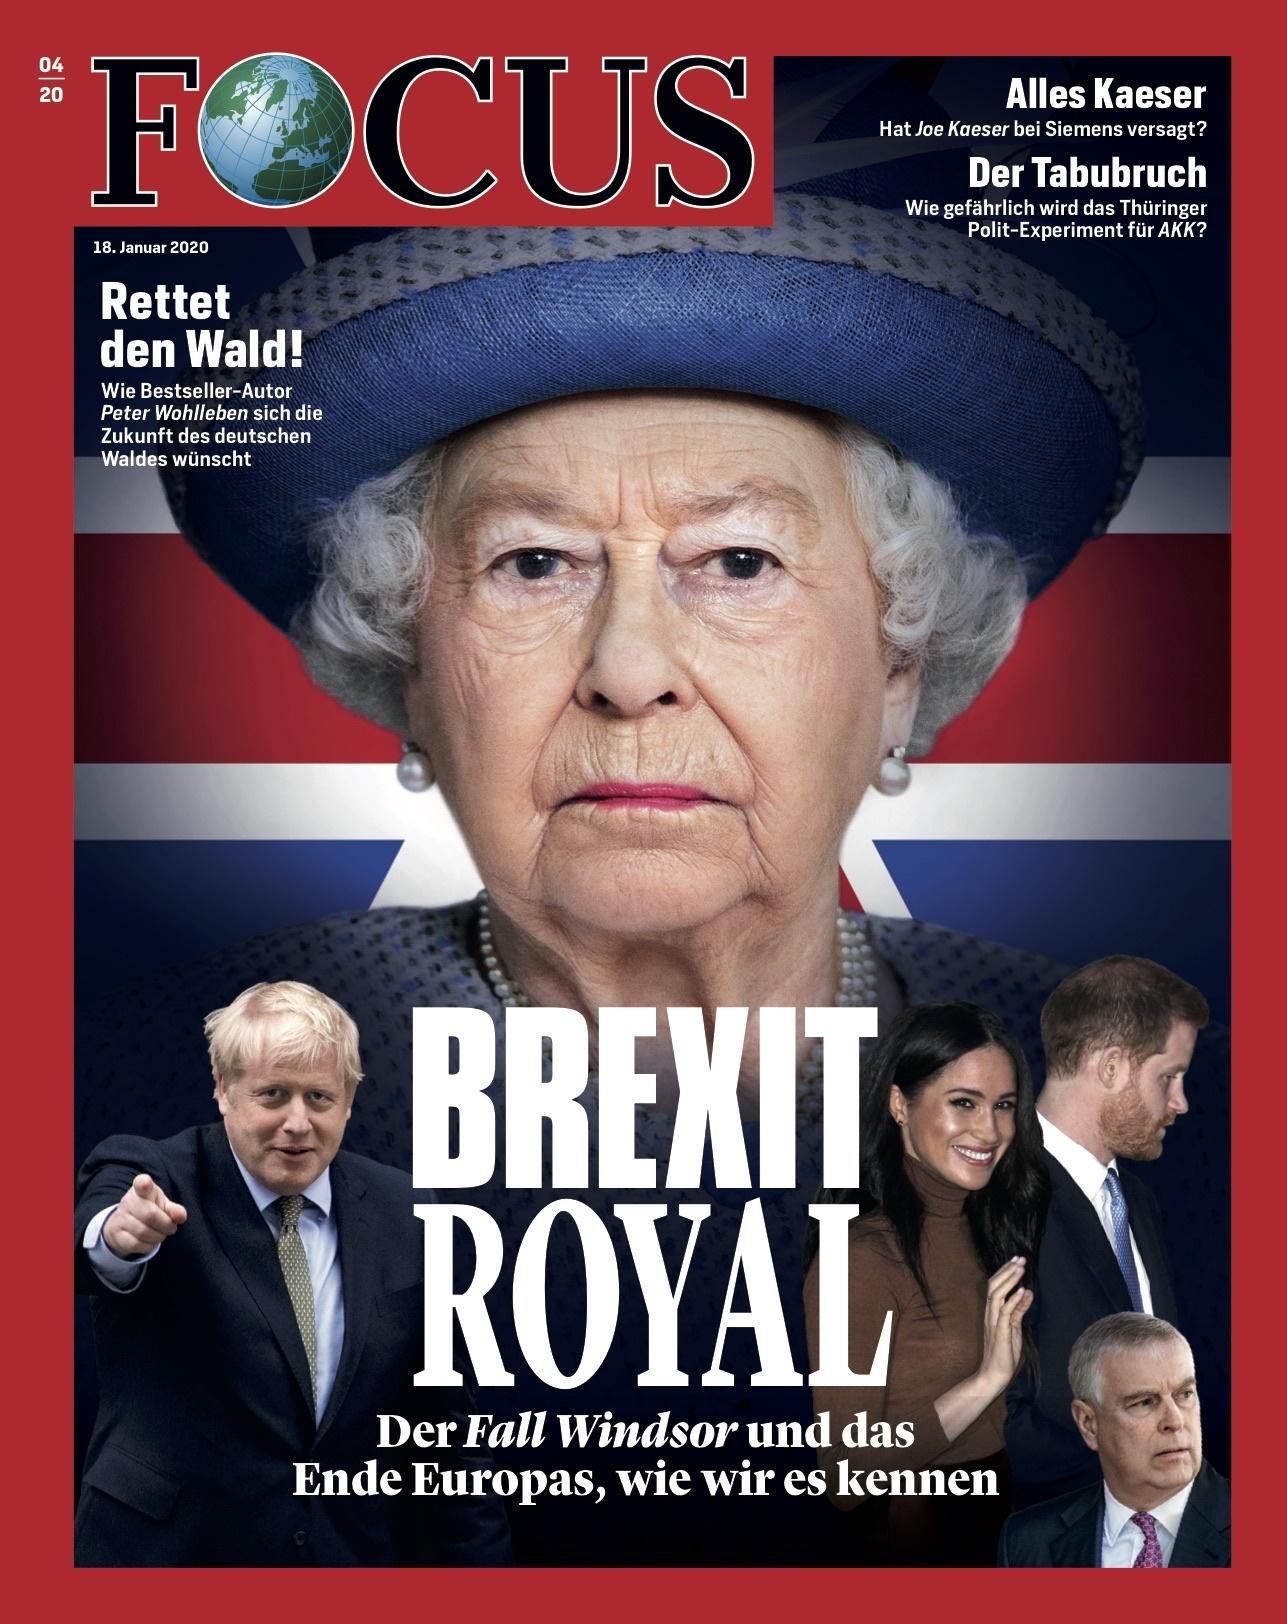 FOCUS Magazin FOCUS Magazin - Brexit Royal